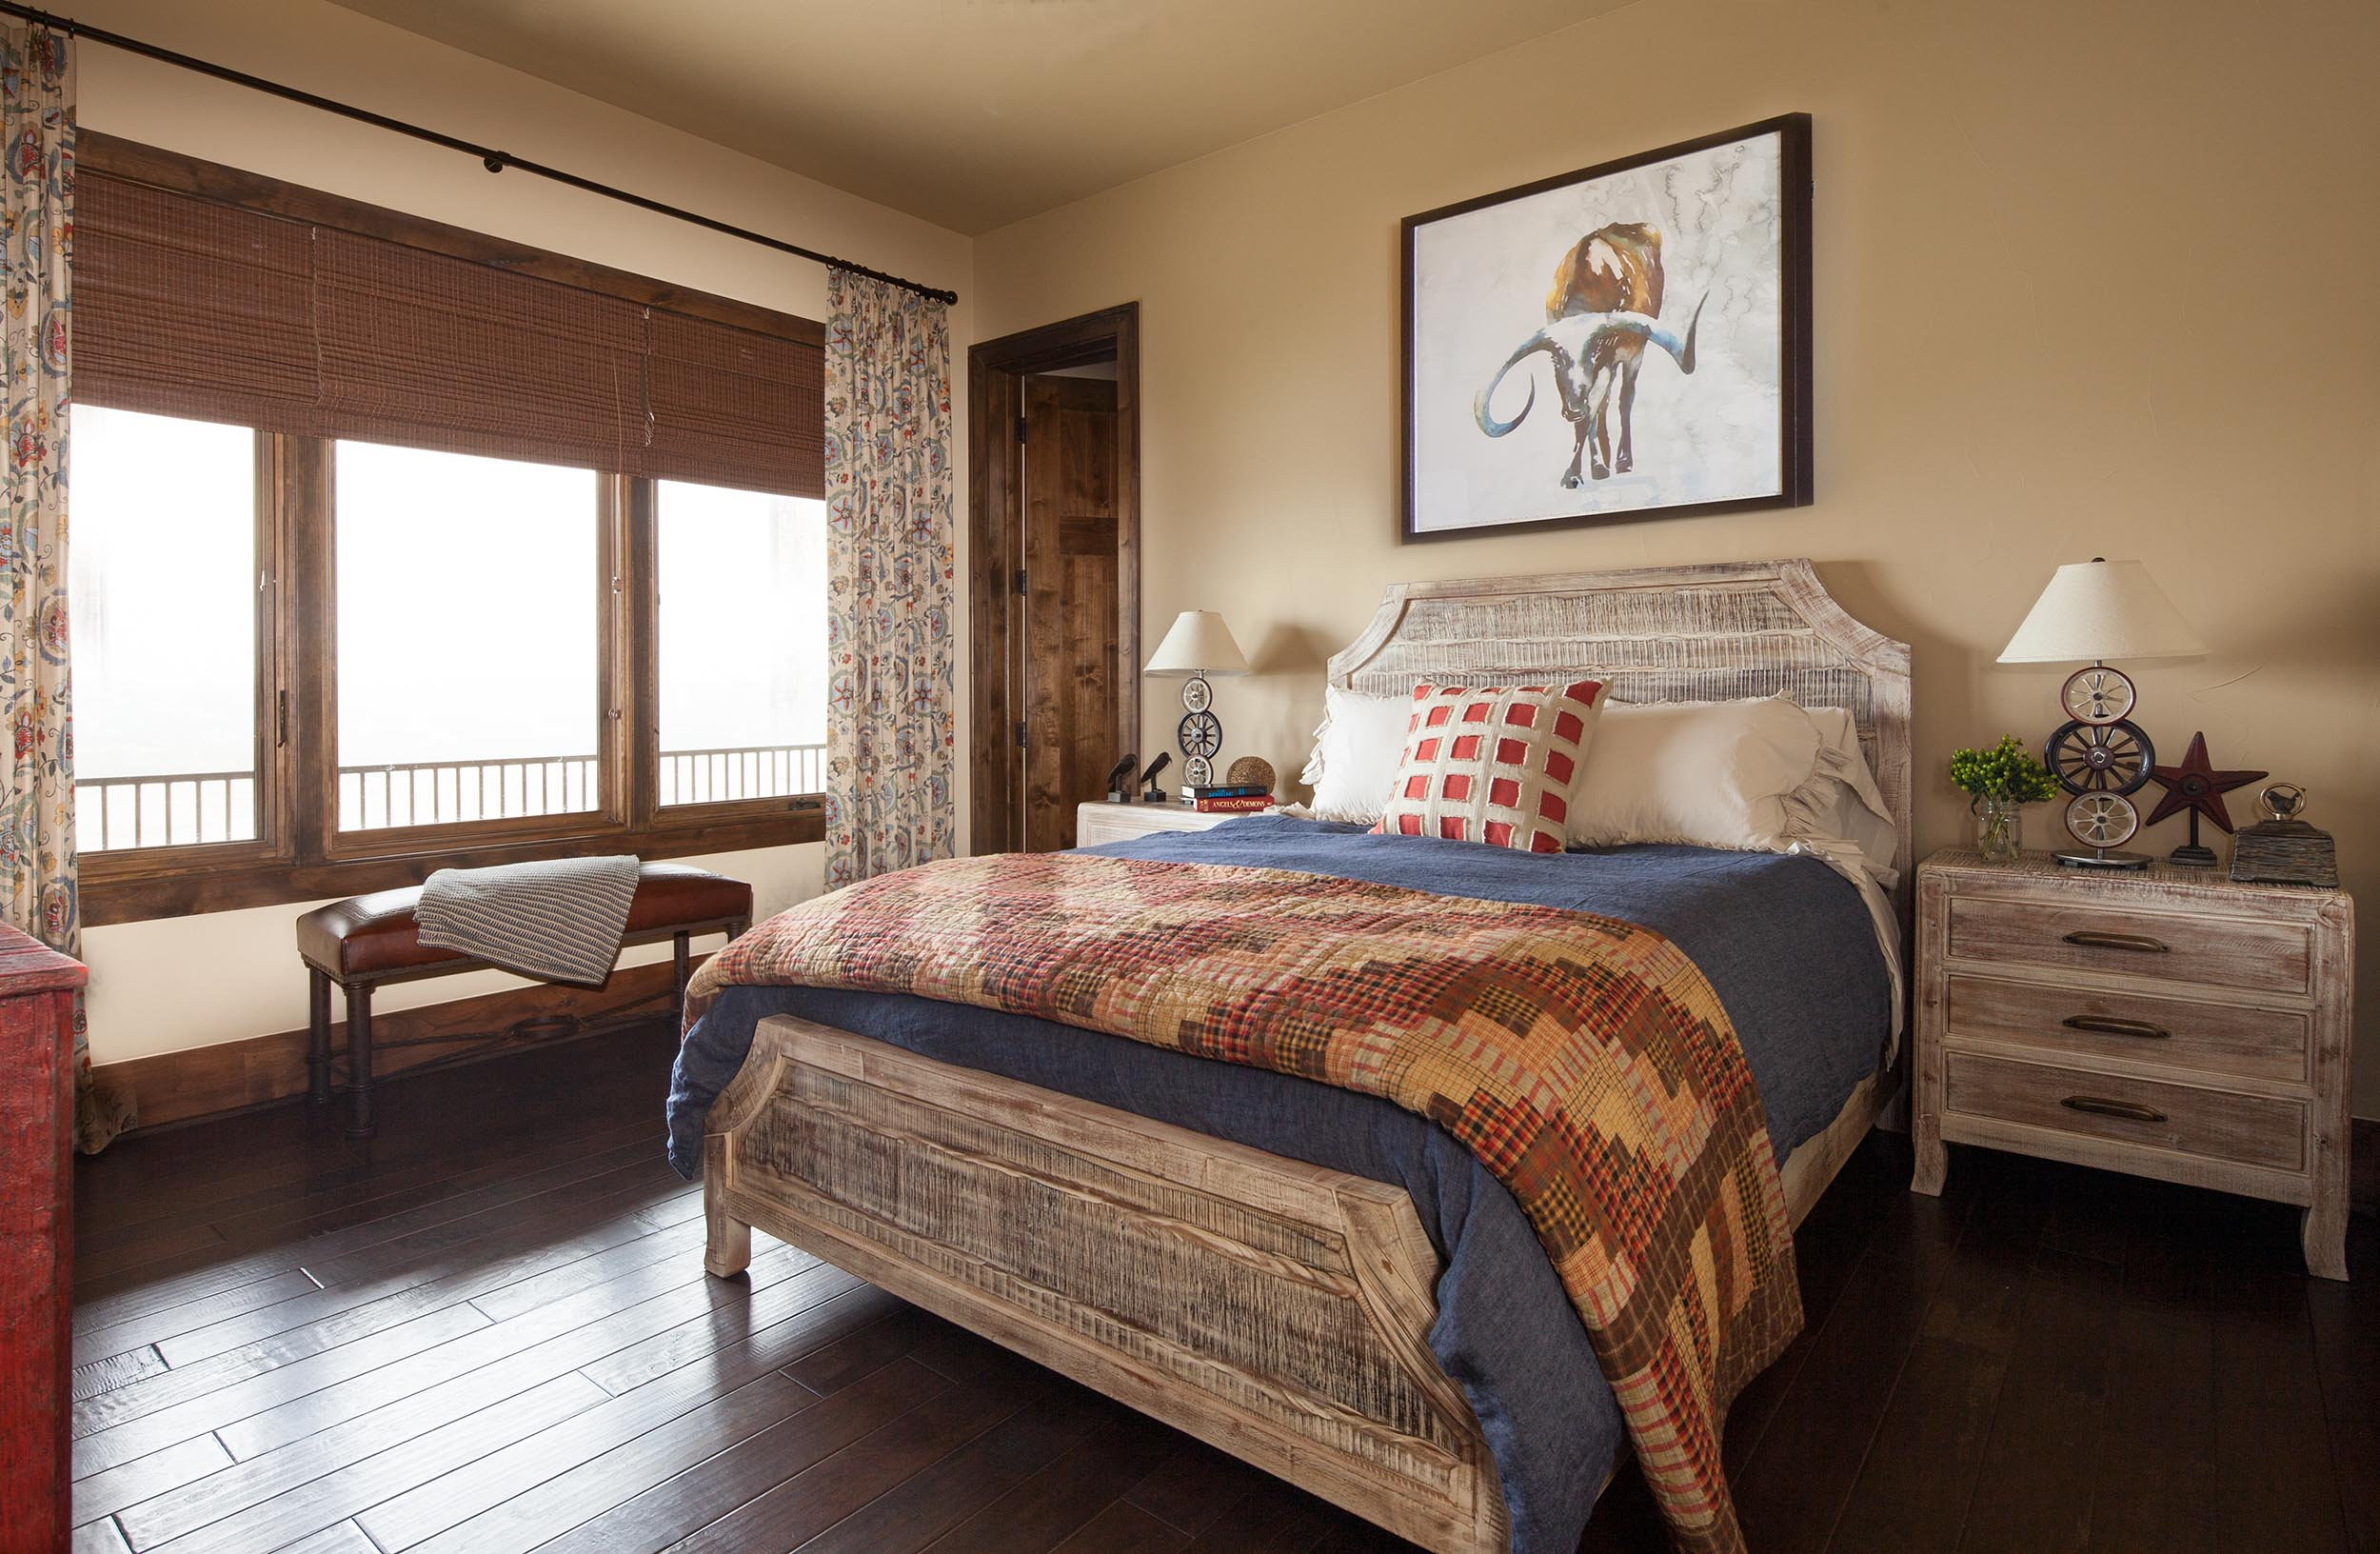 austin-house-bedroom-interior-design.jpg